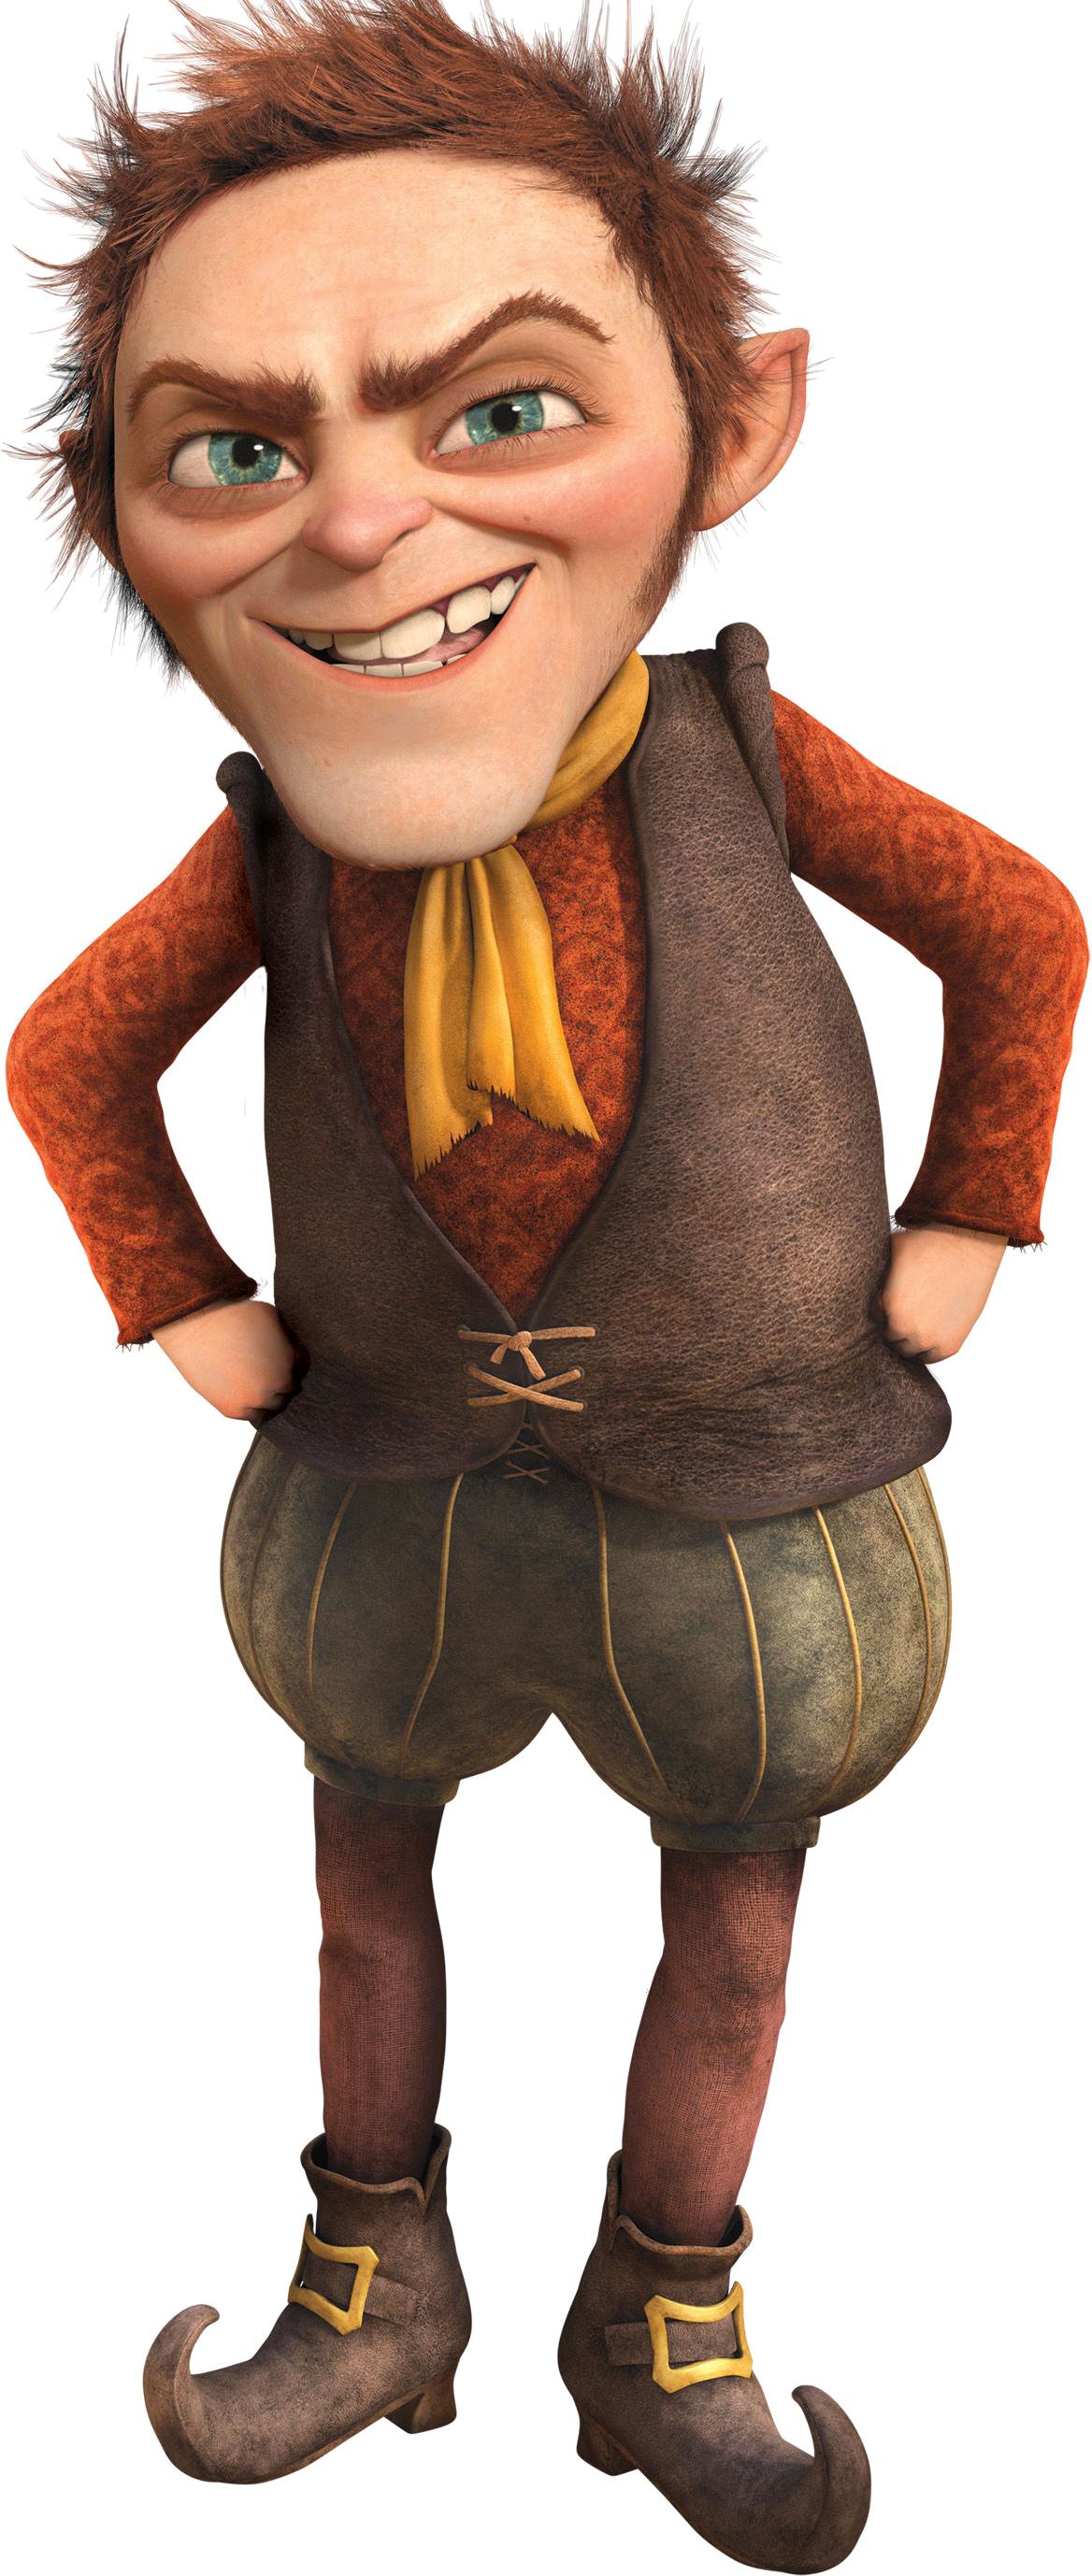 Rumpelstiltskin - WikiShrek - The wiki all about Shrek